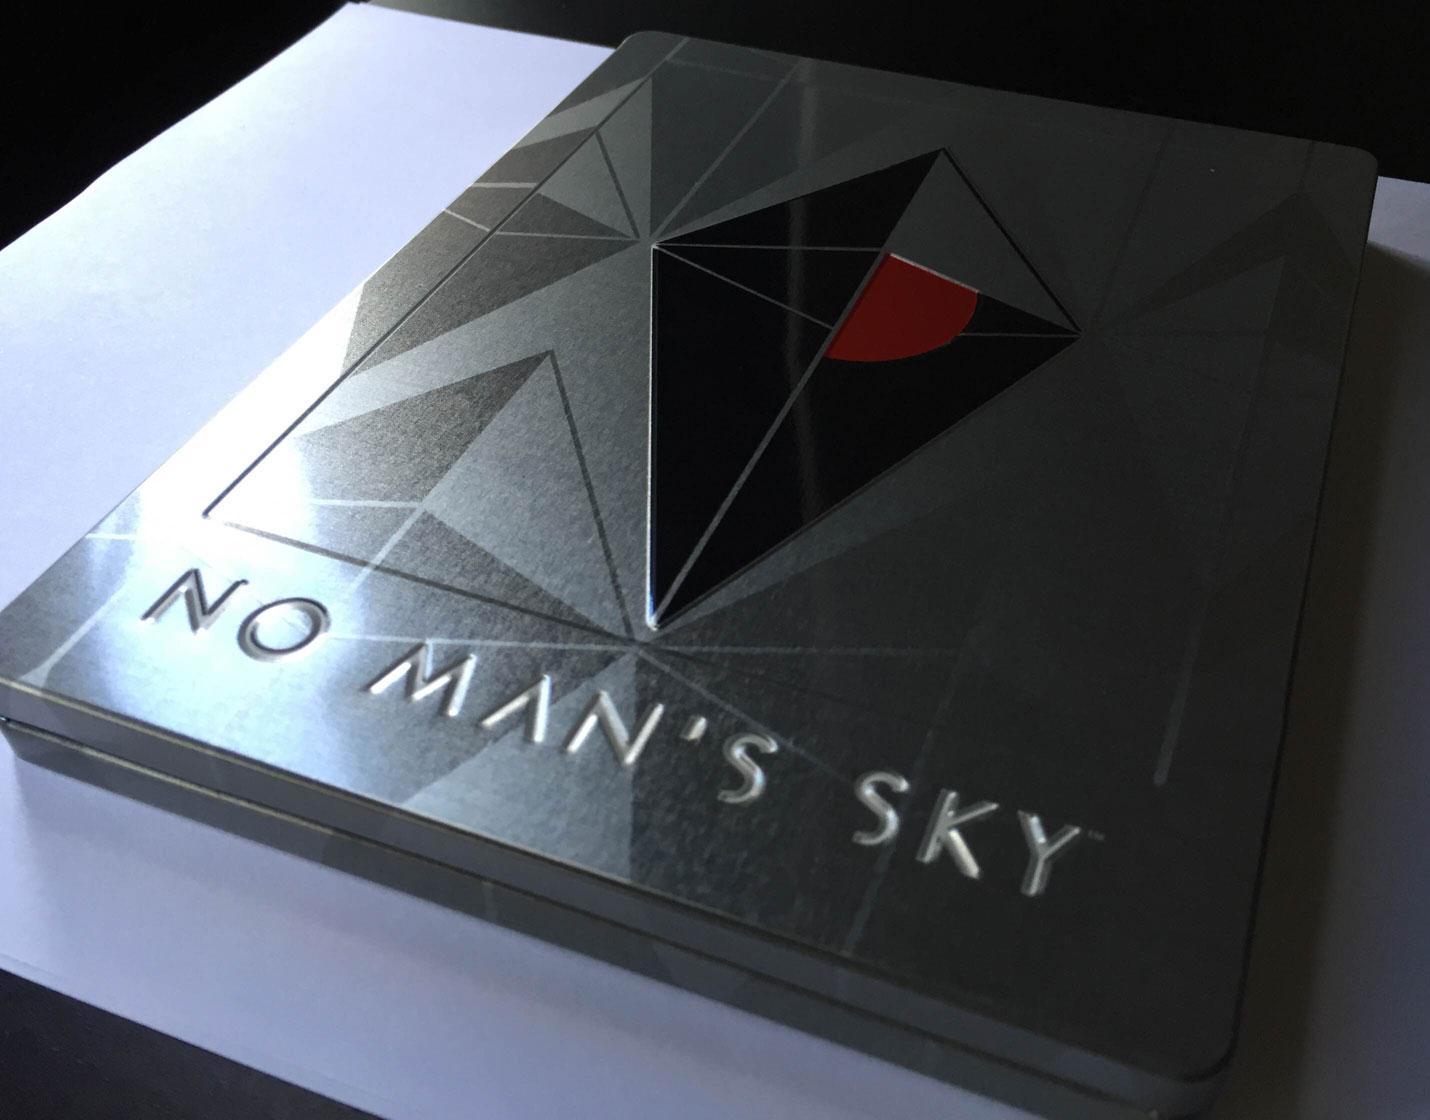 No-Man's-Sky-steelbook-2